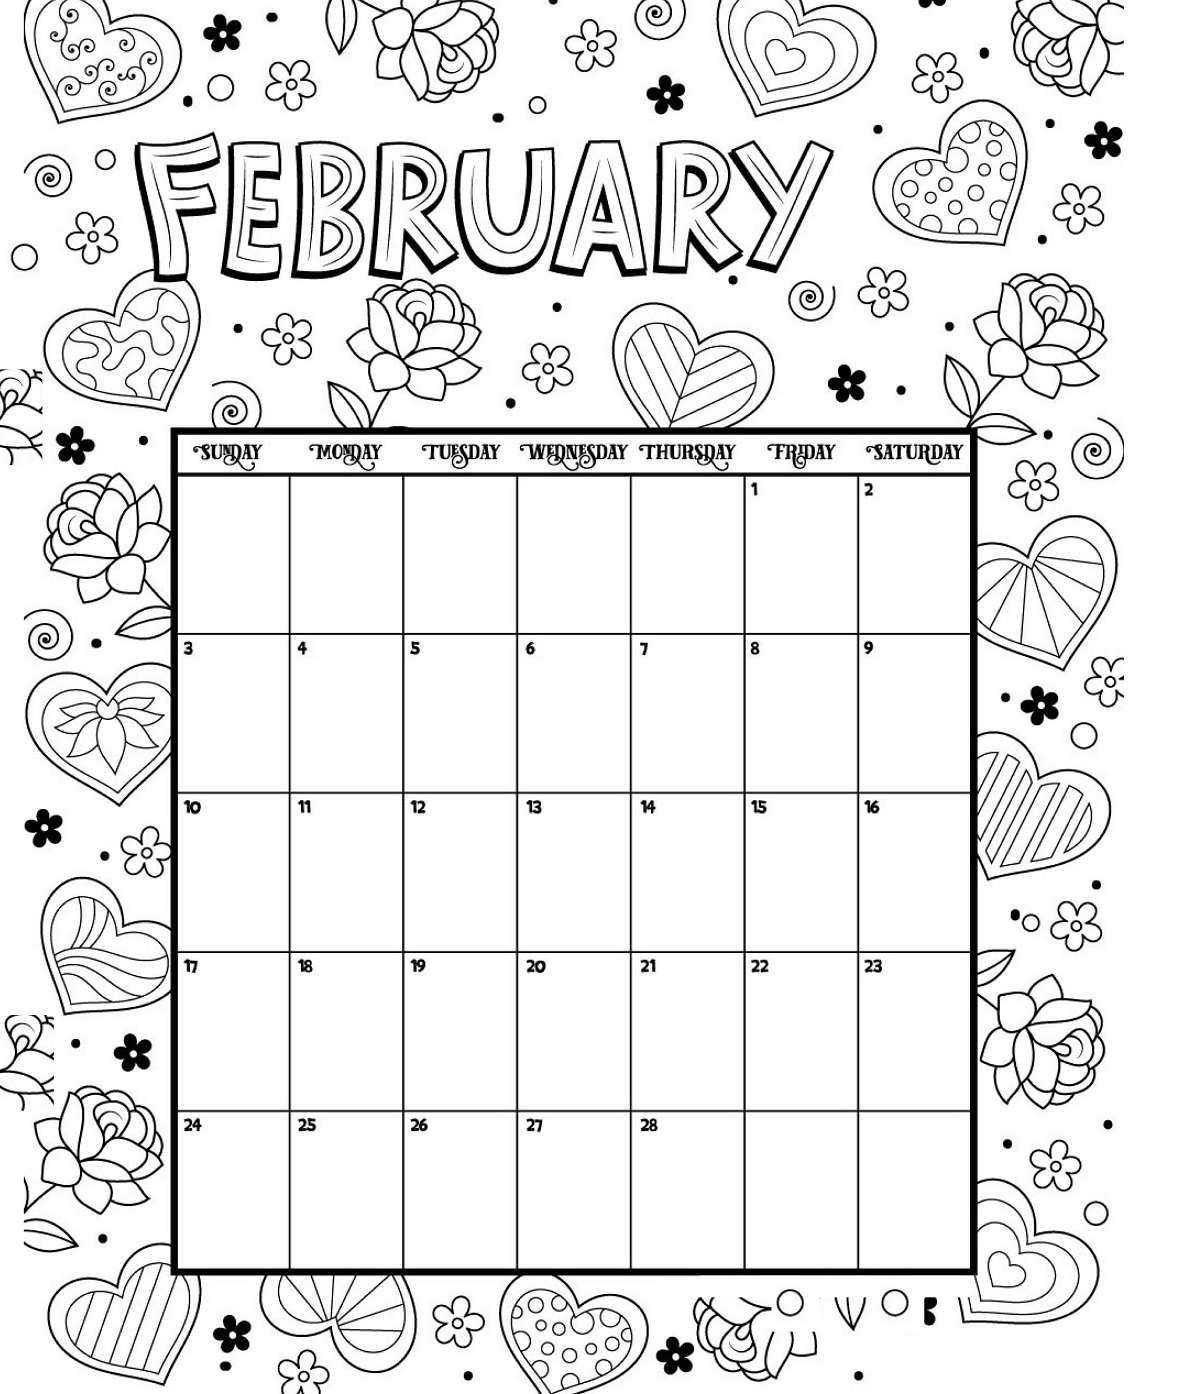 February Printable Coloring Calendar